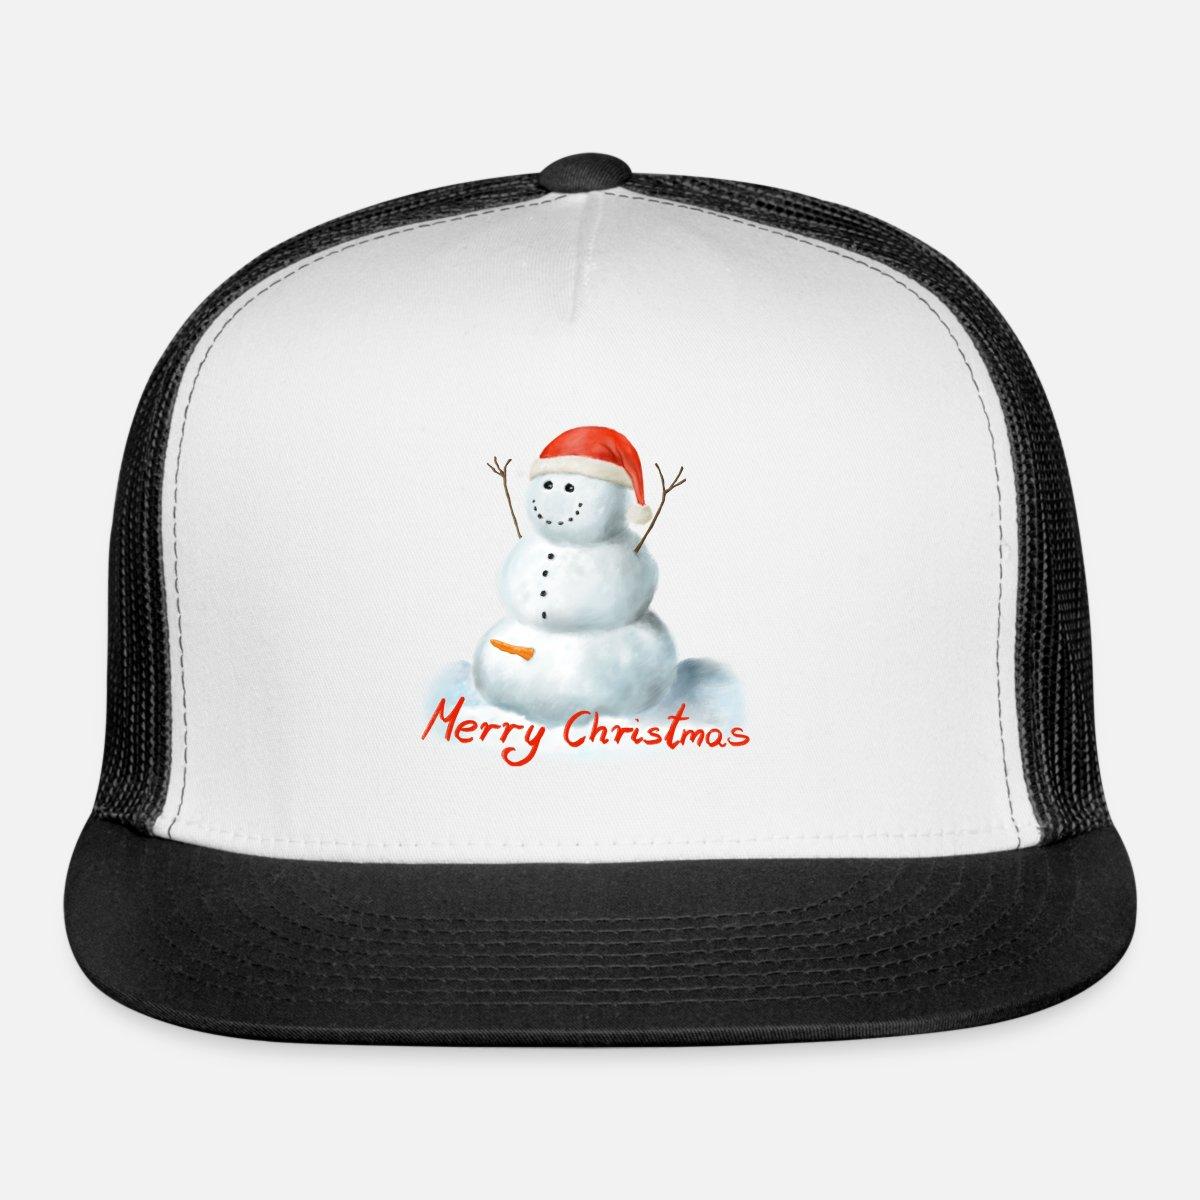 15524ce51 Happy Horny Snowman Santa Hat Merry Christmas Trucker Cap - white/black